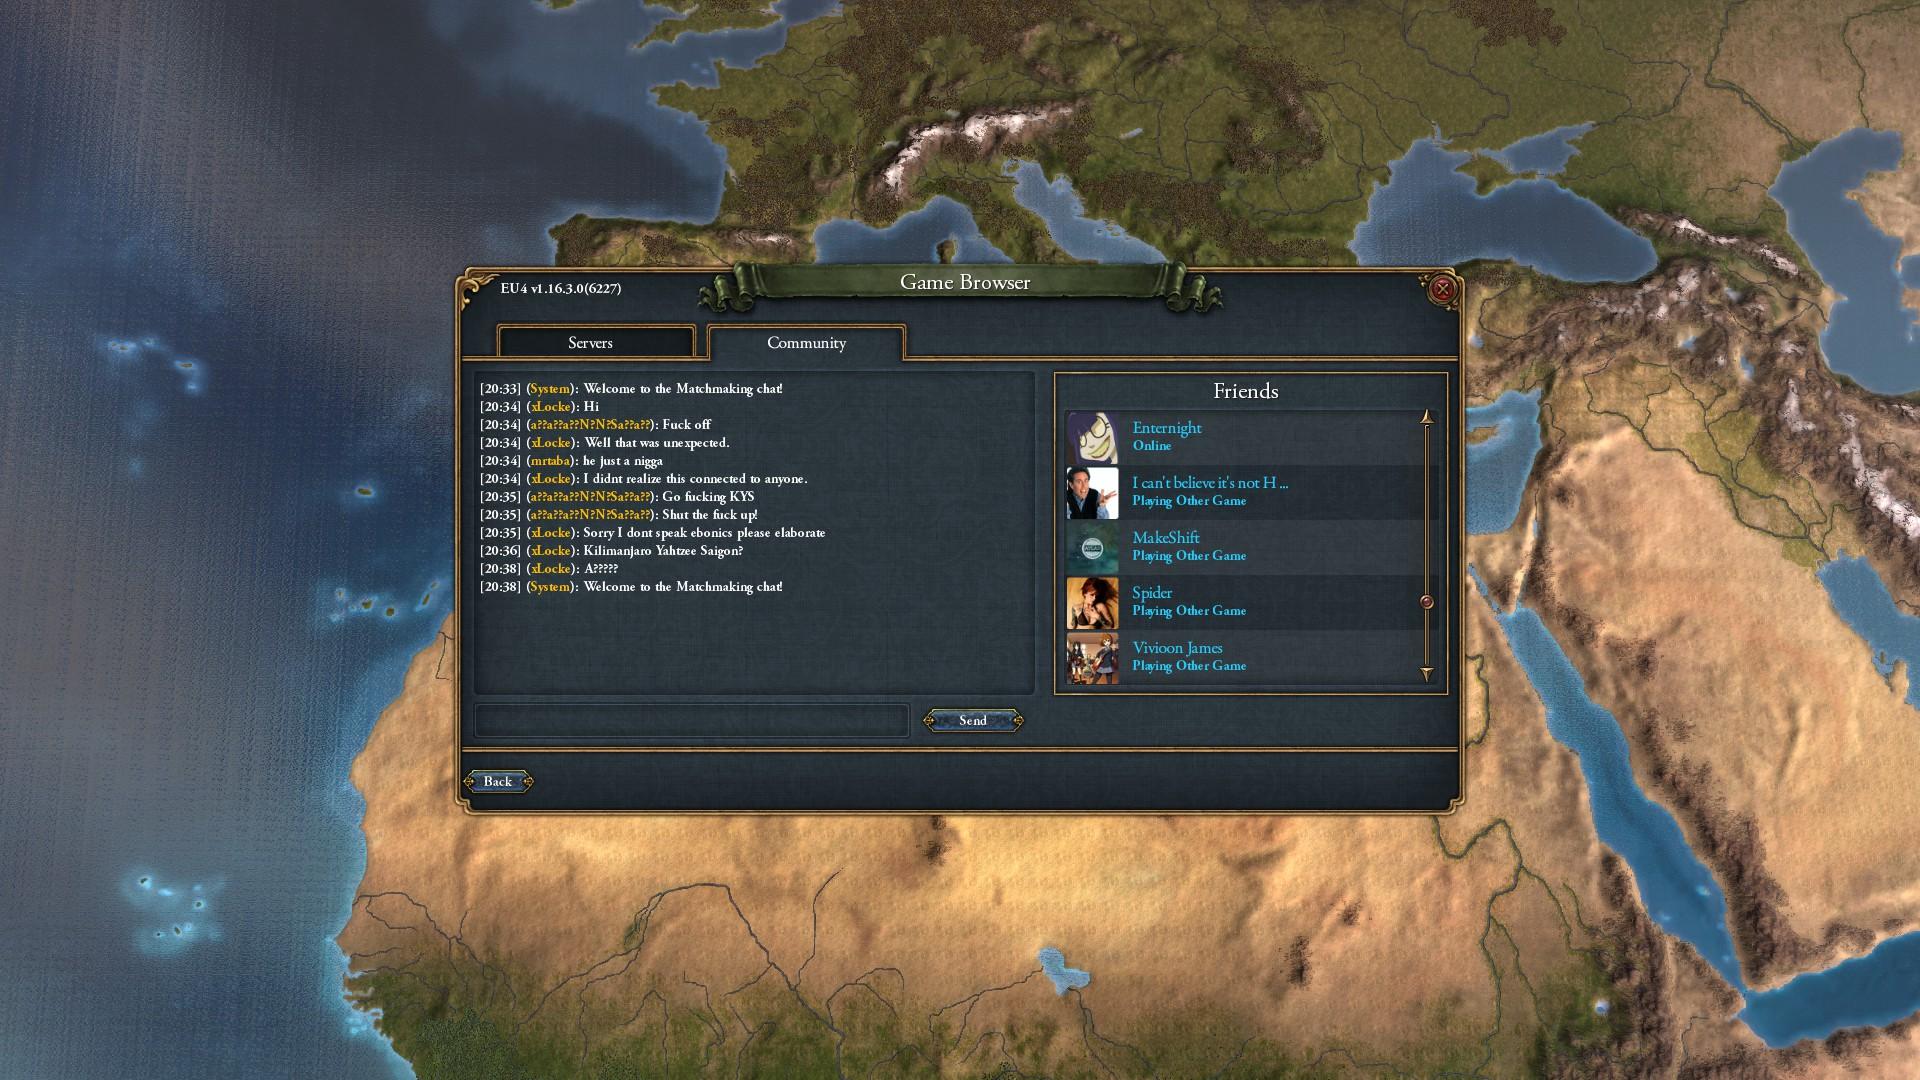 Eu4 matchmaking